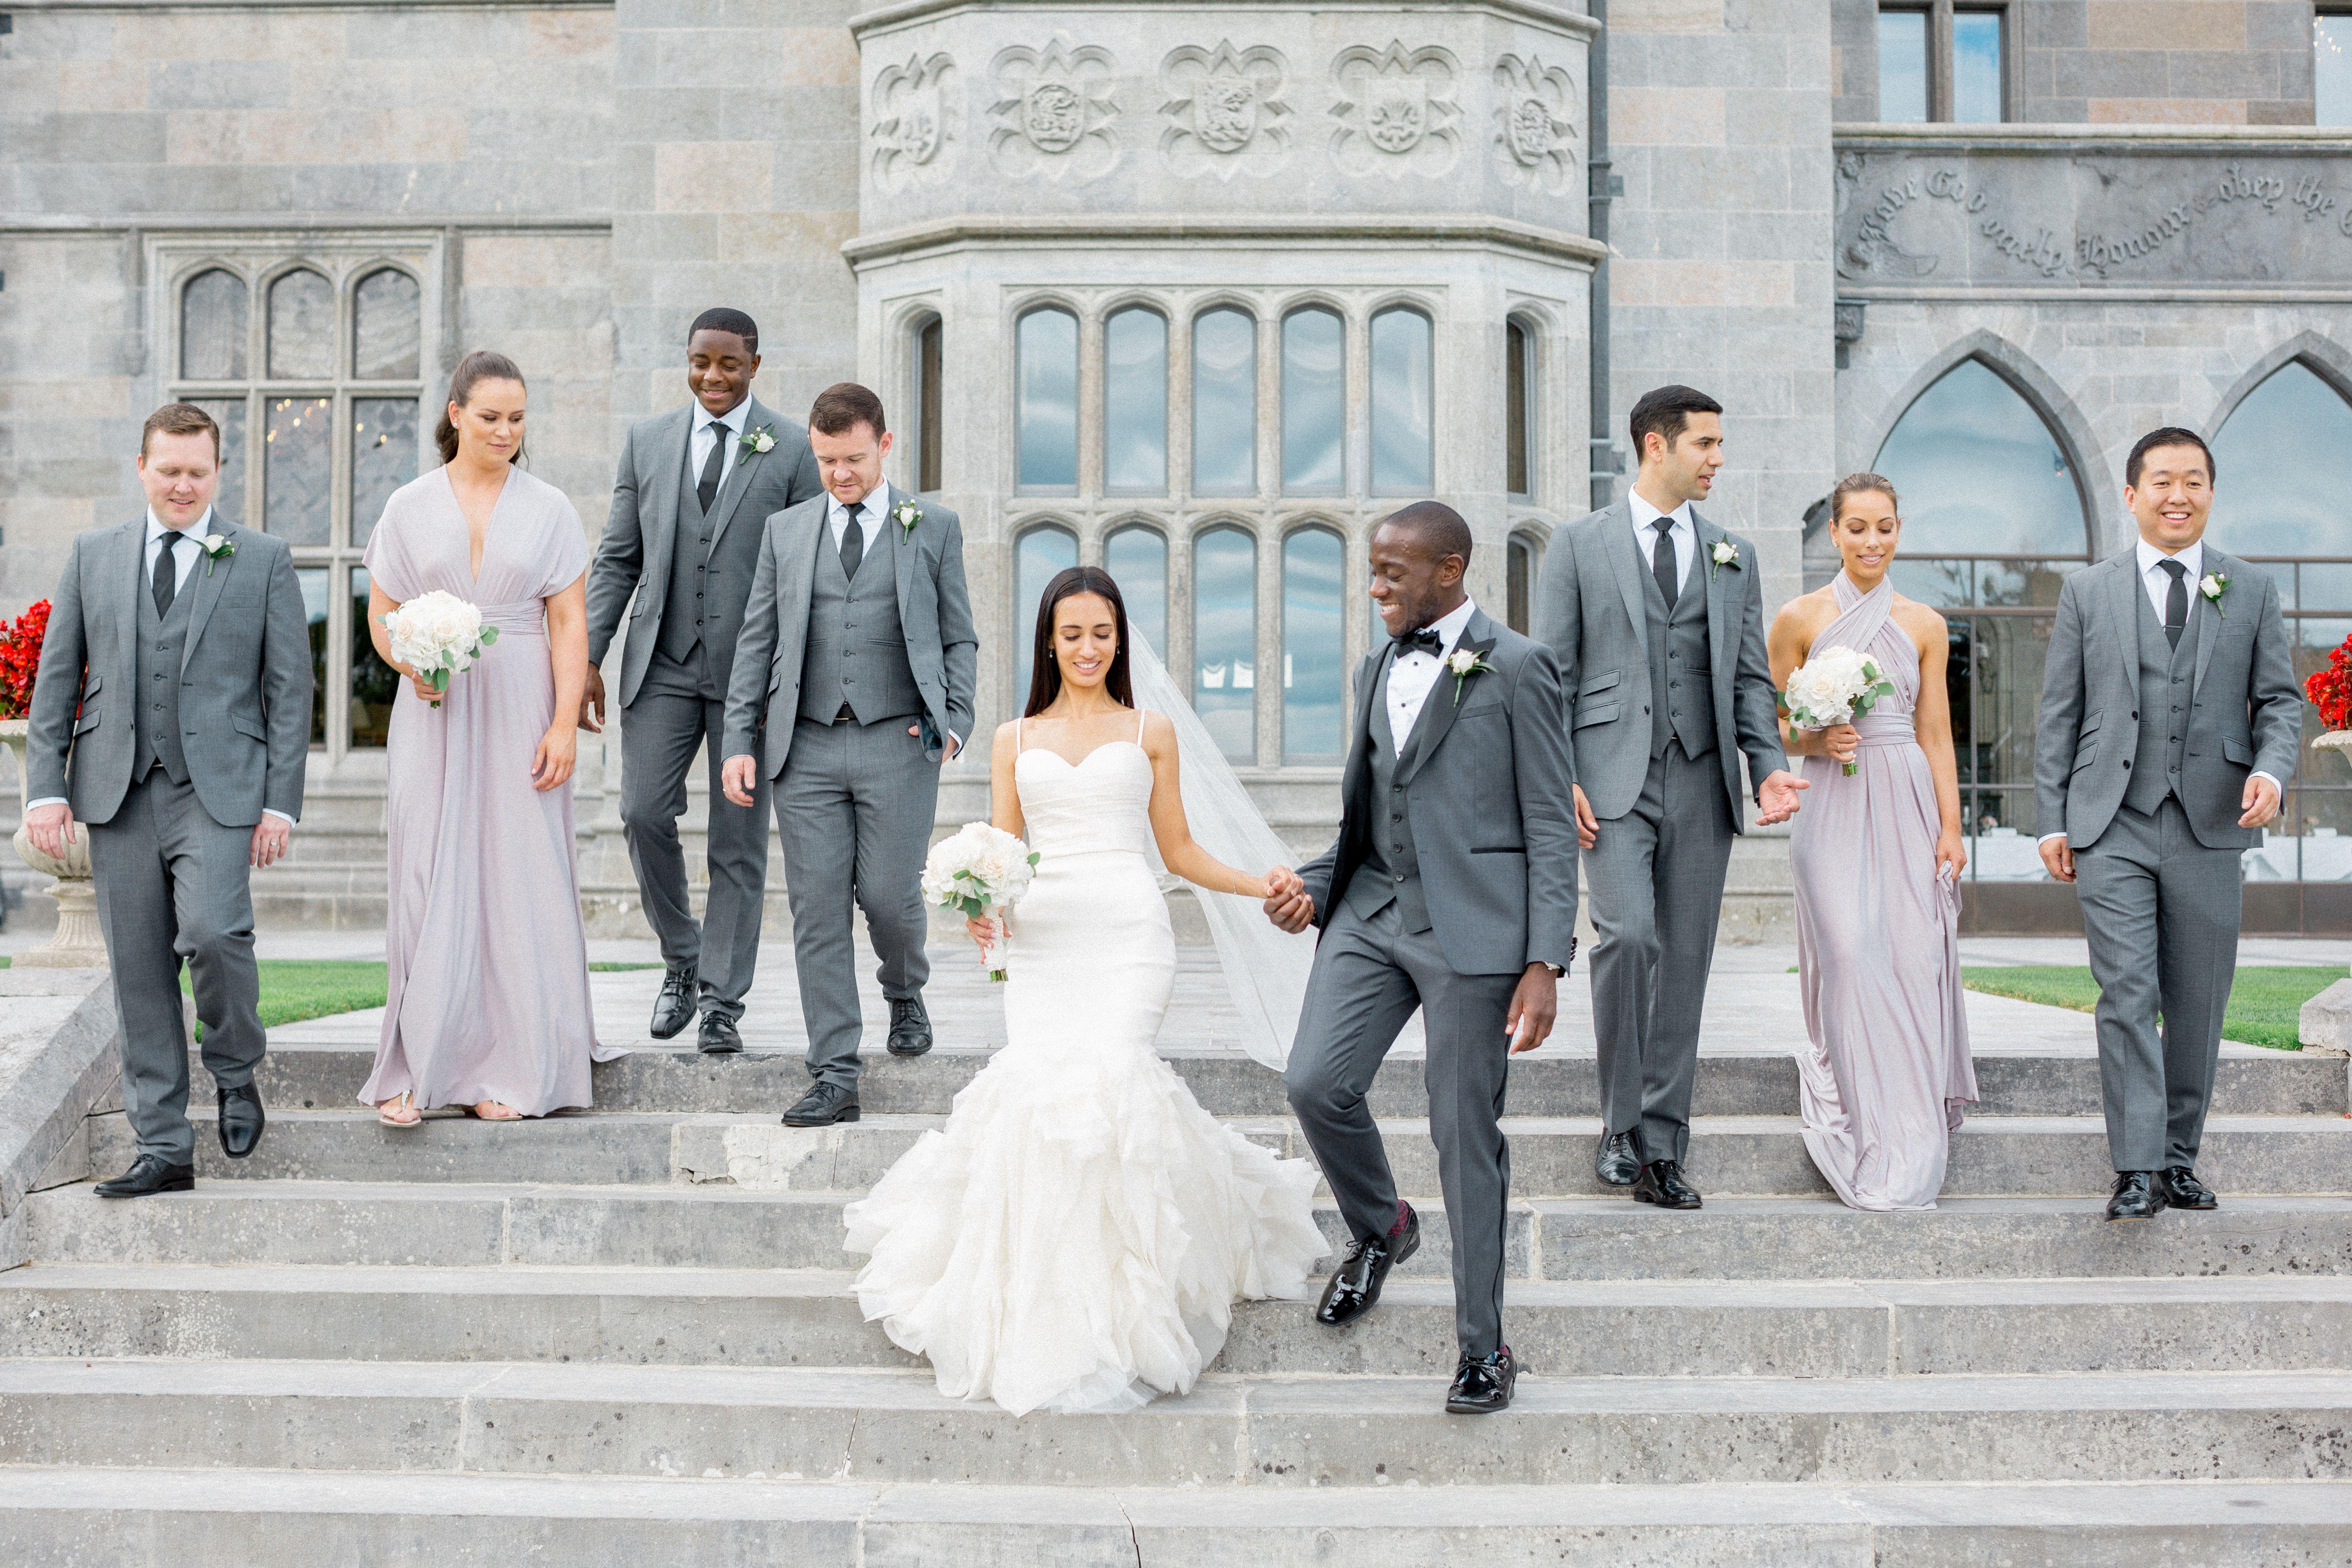 Pin By The Cedars Ranch On Romantic & Fairytale Wedding